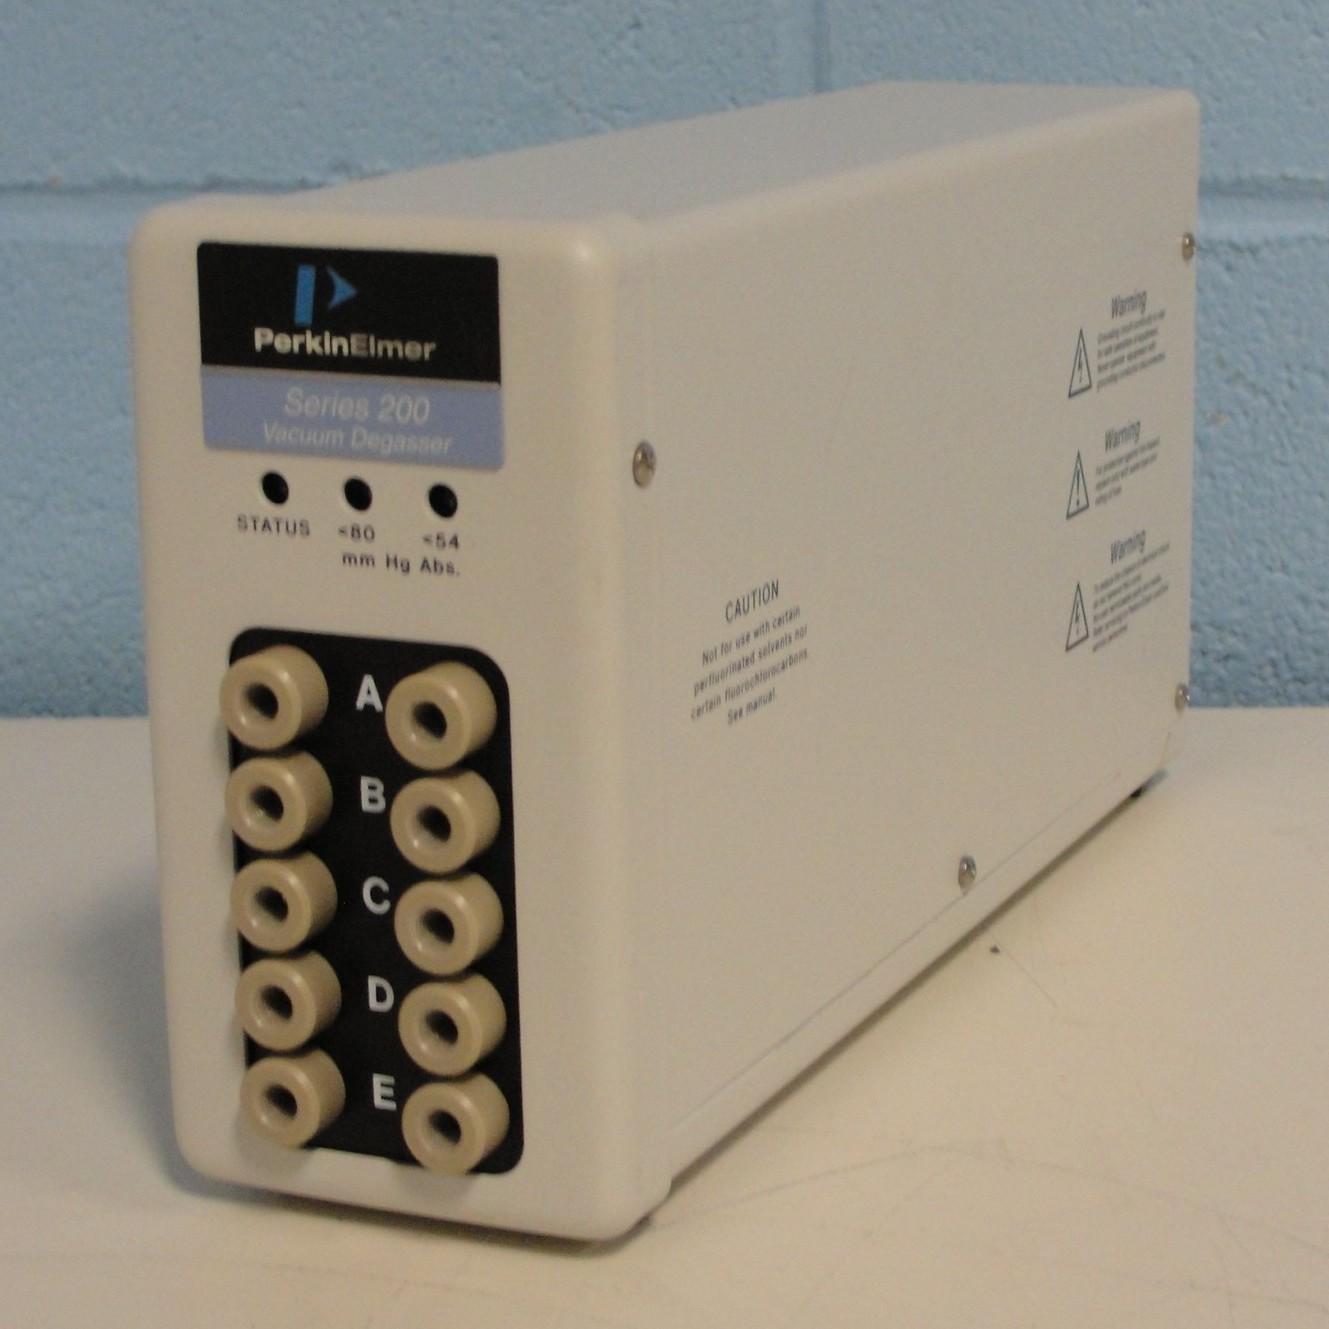 Perkin Elmer 5 Channel Series 200 Vacuum Degasser Image